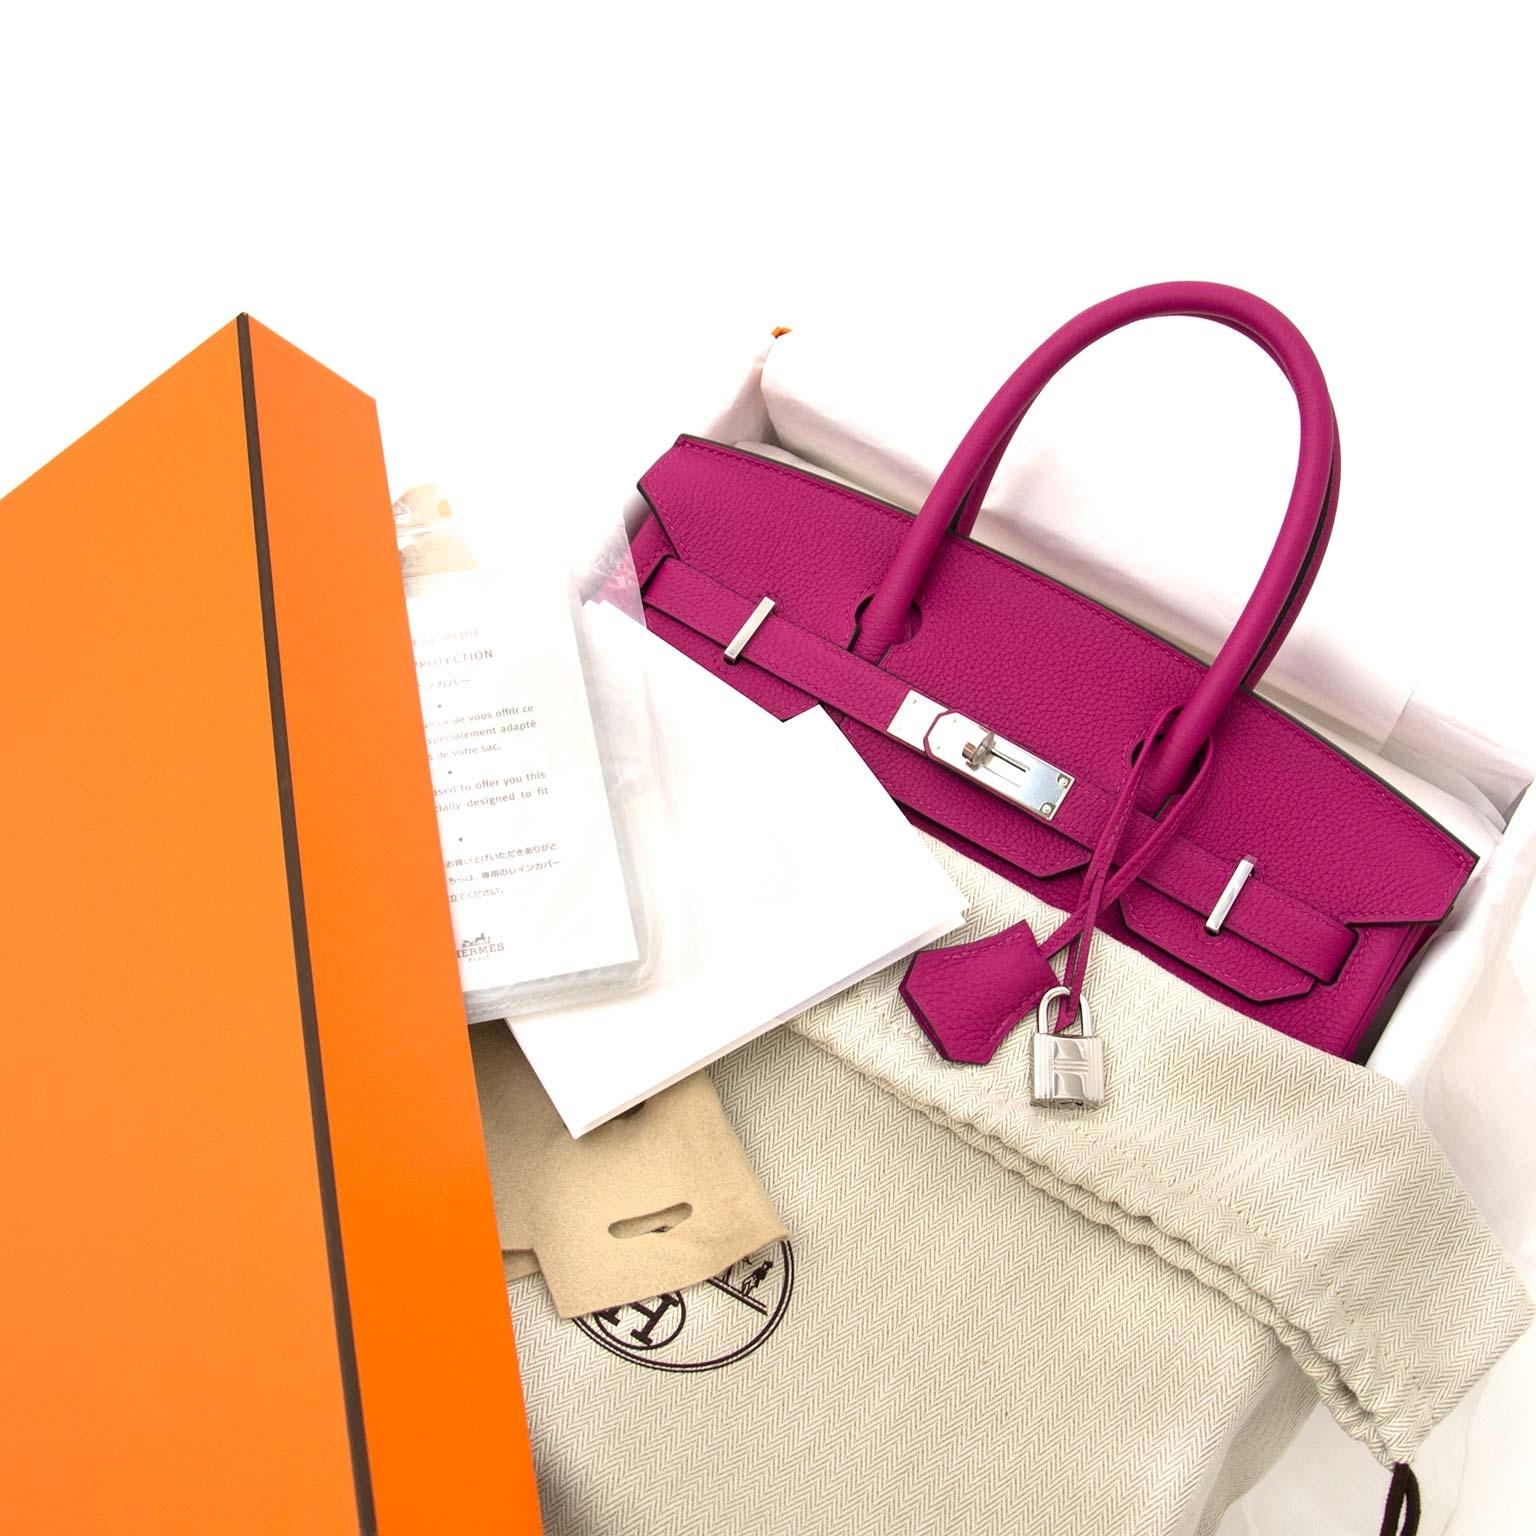 acheter en ligne chez labellov.com Hermès Birkin 30 Togo Pourpre PHW